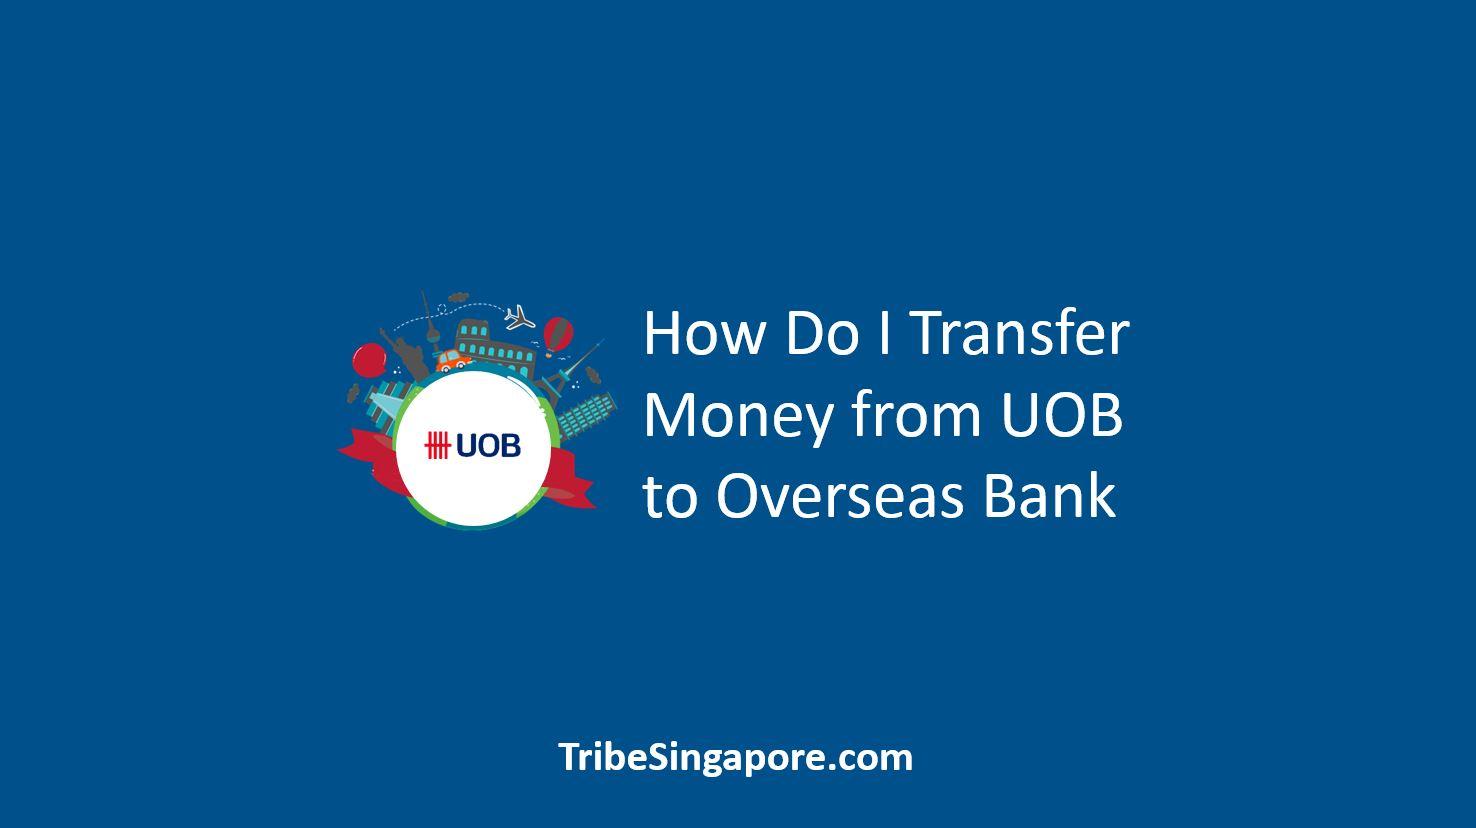 How Do I Transfer Money from UOB to Overseas Bank